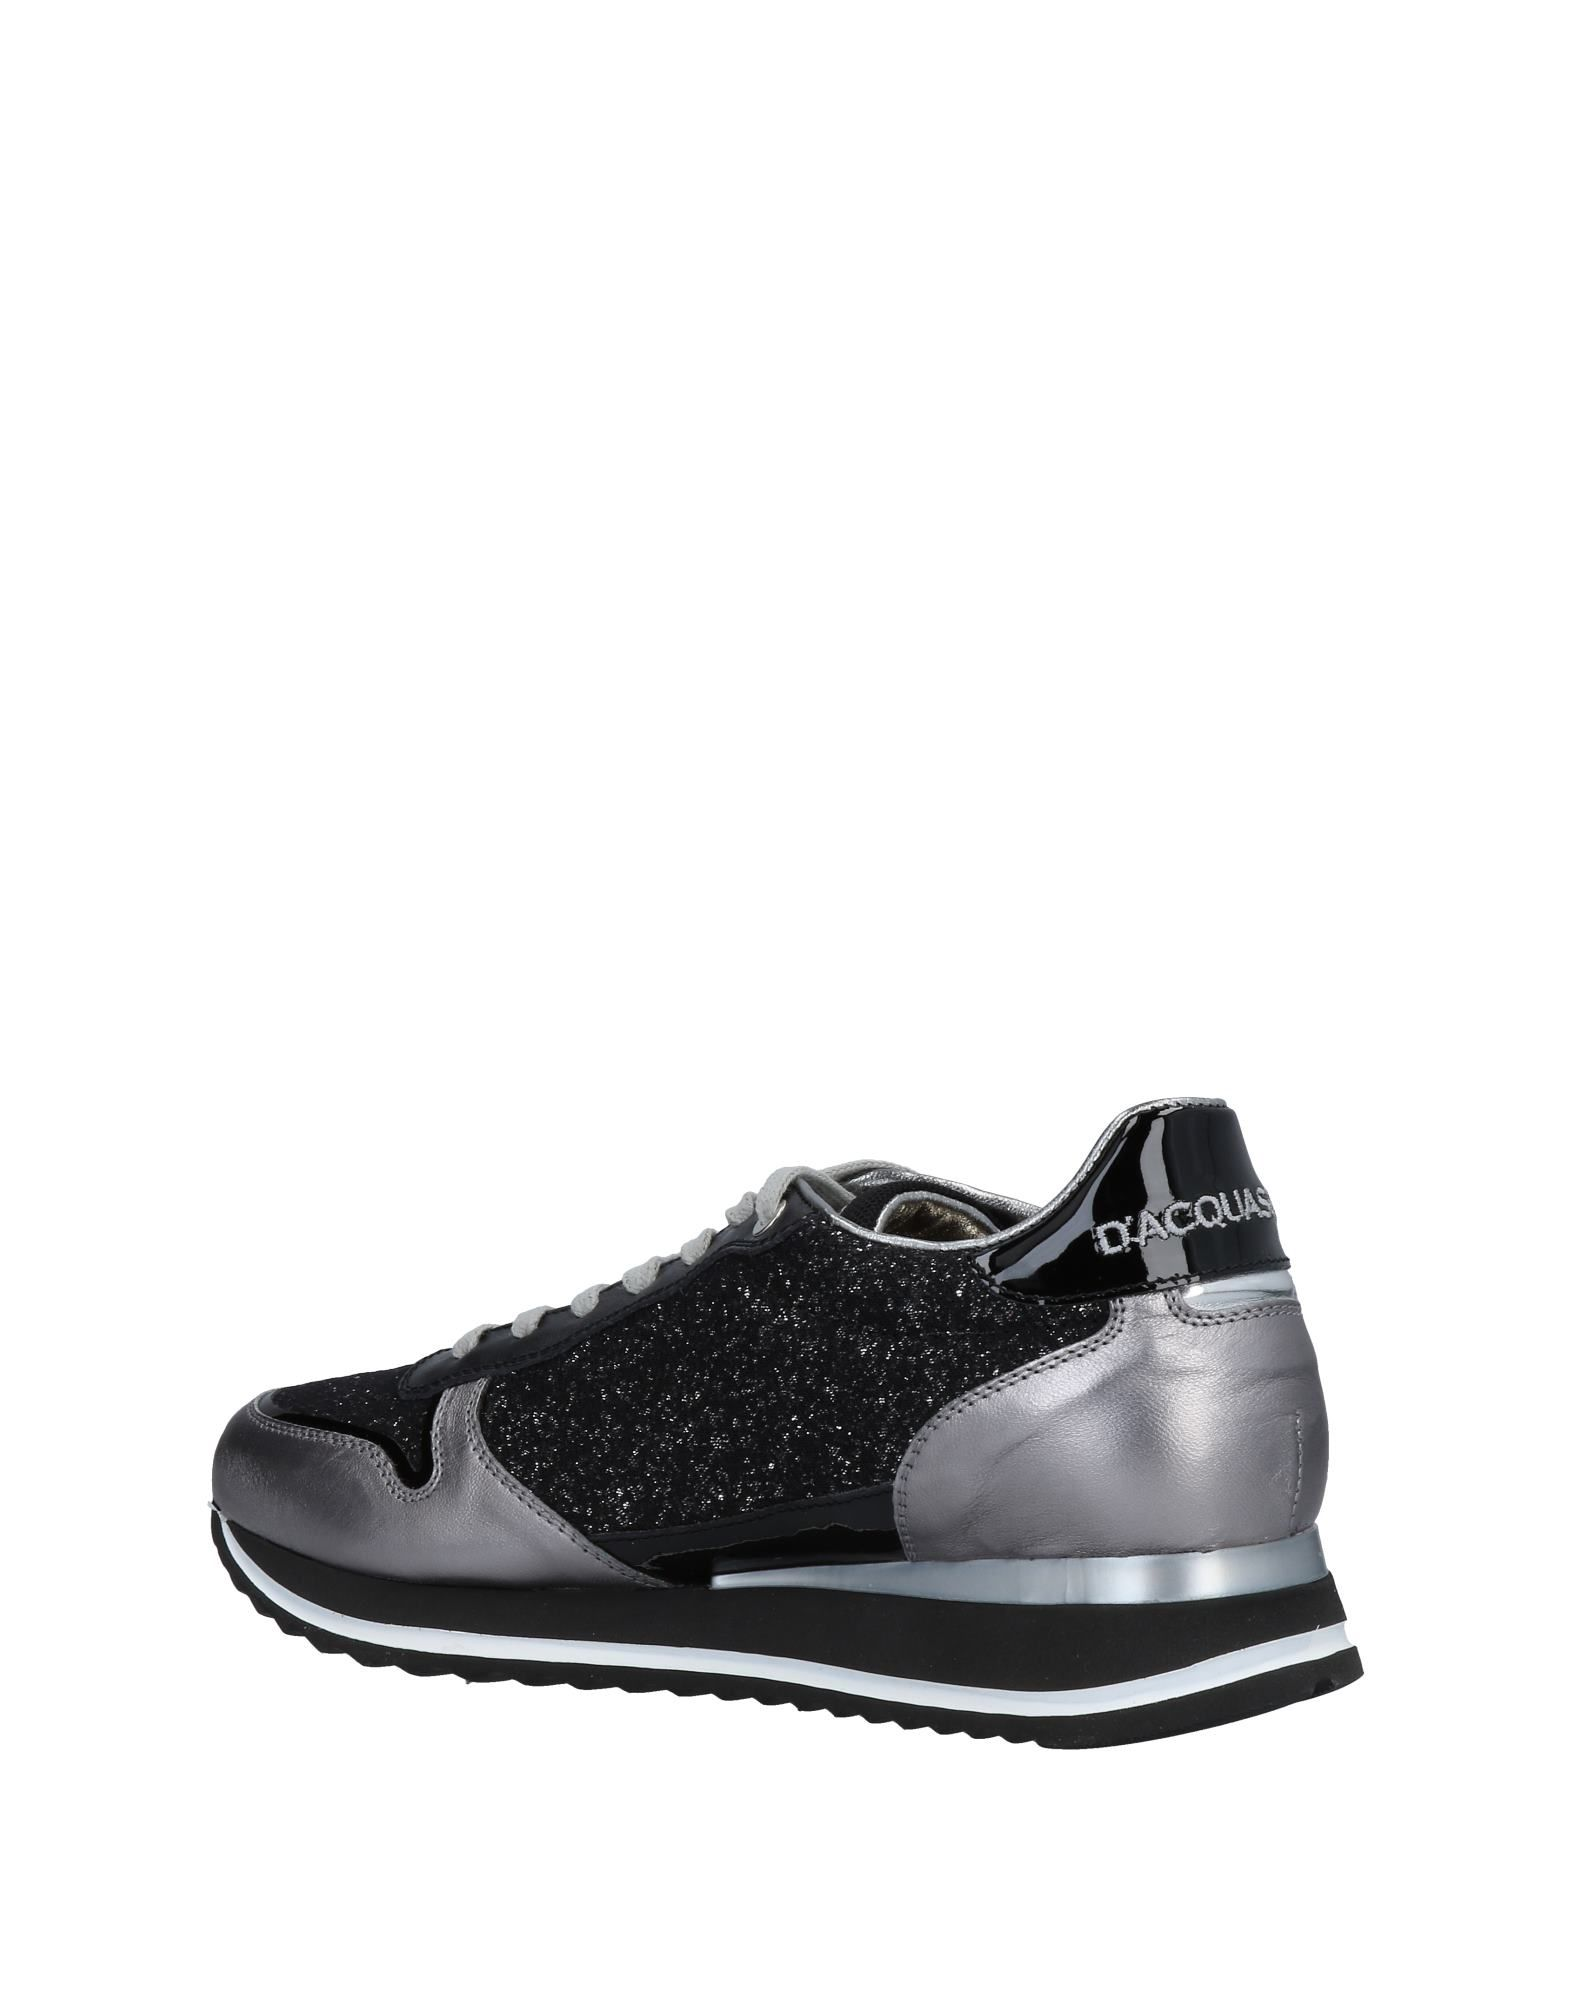 D'Acquasparta Sneakers Gute Damen  11492723FP Gute Sneakers Qualität beliebte Schuhe 5619d0